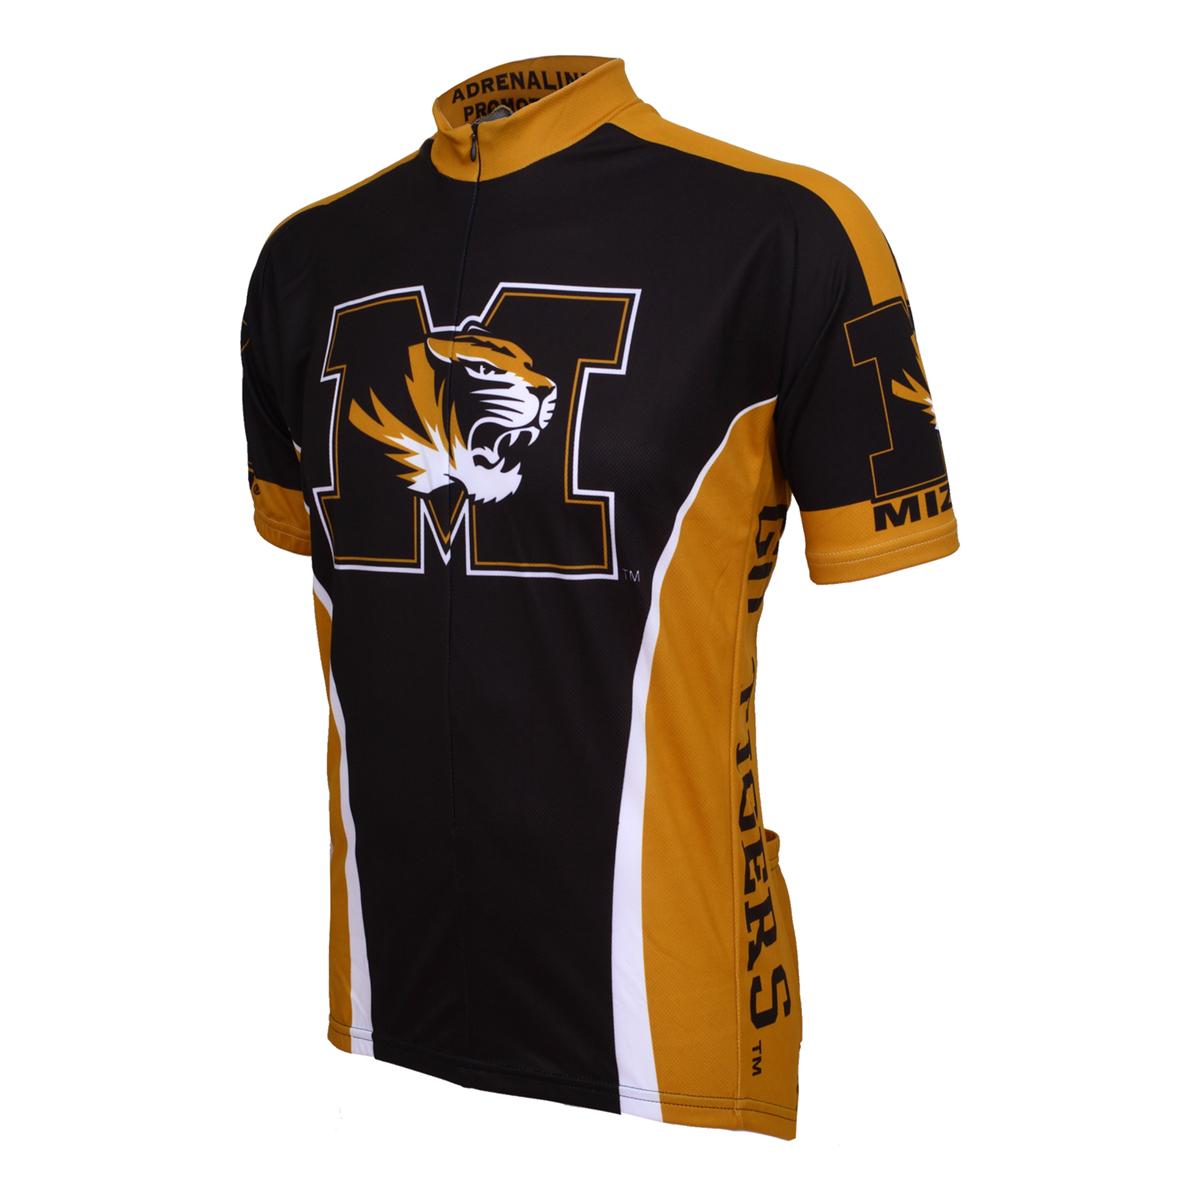 Adrenaline Promotions University of Missouri Tigers Cycling Jersey